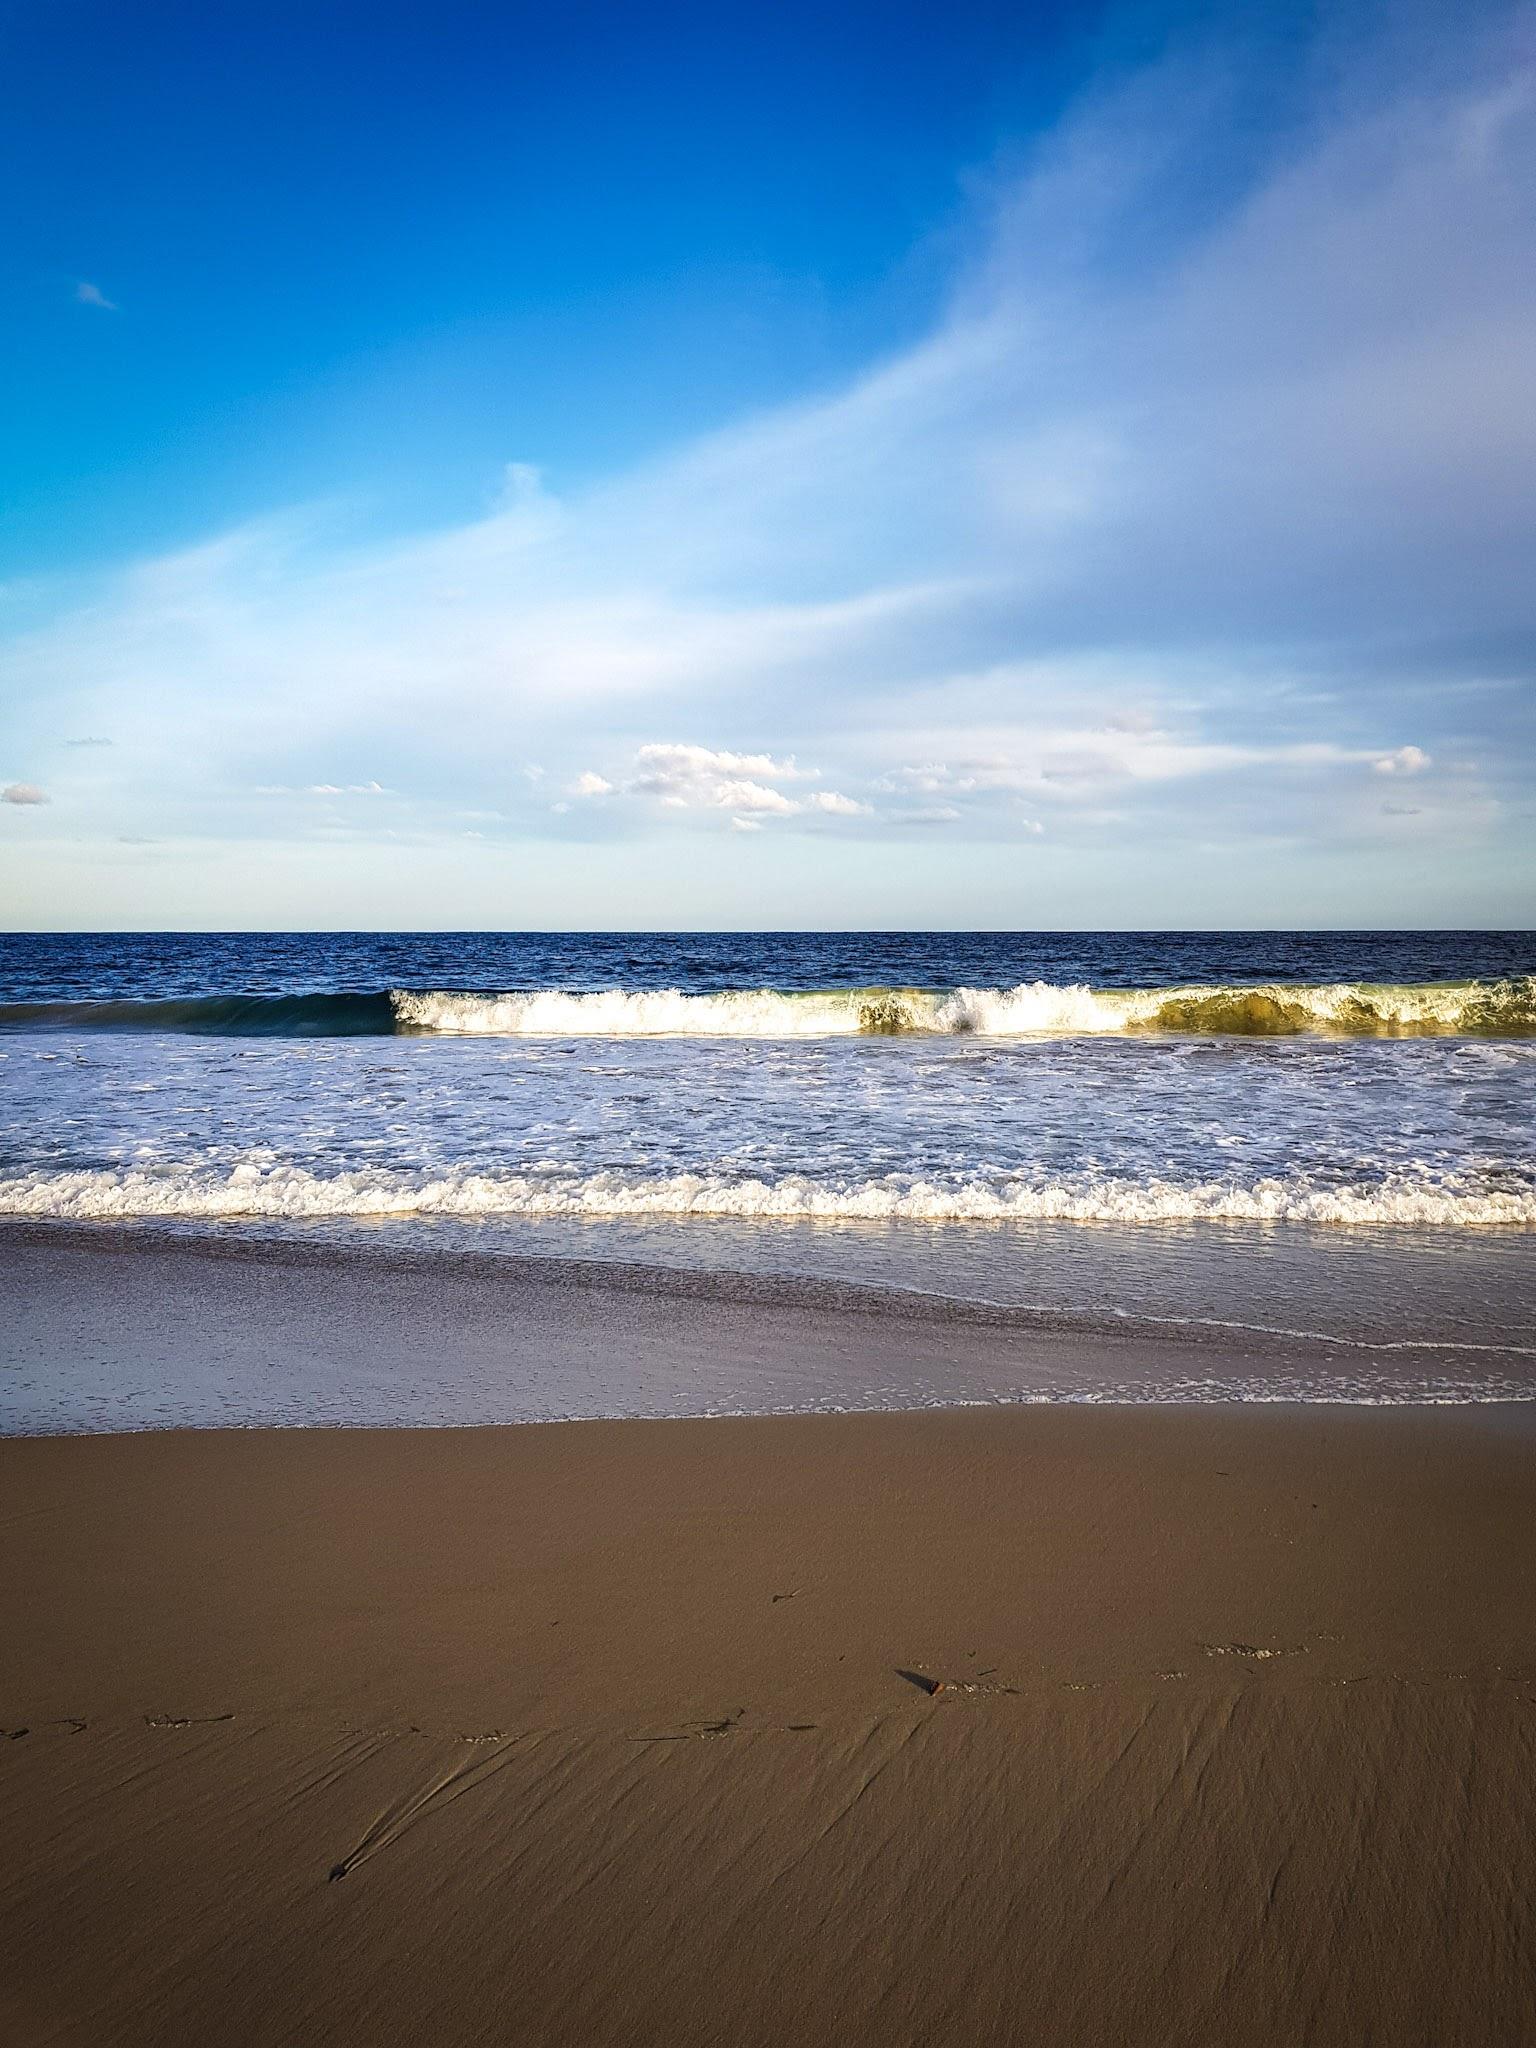 Those waves ...  Zenith Beach, Shoal Bay